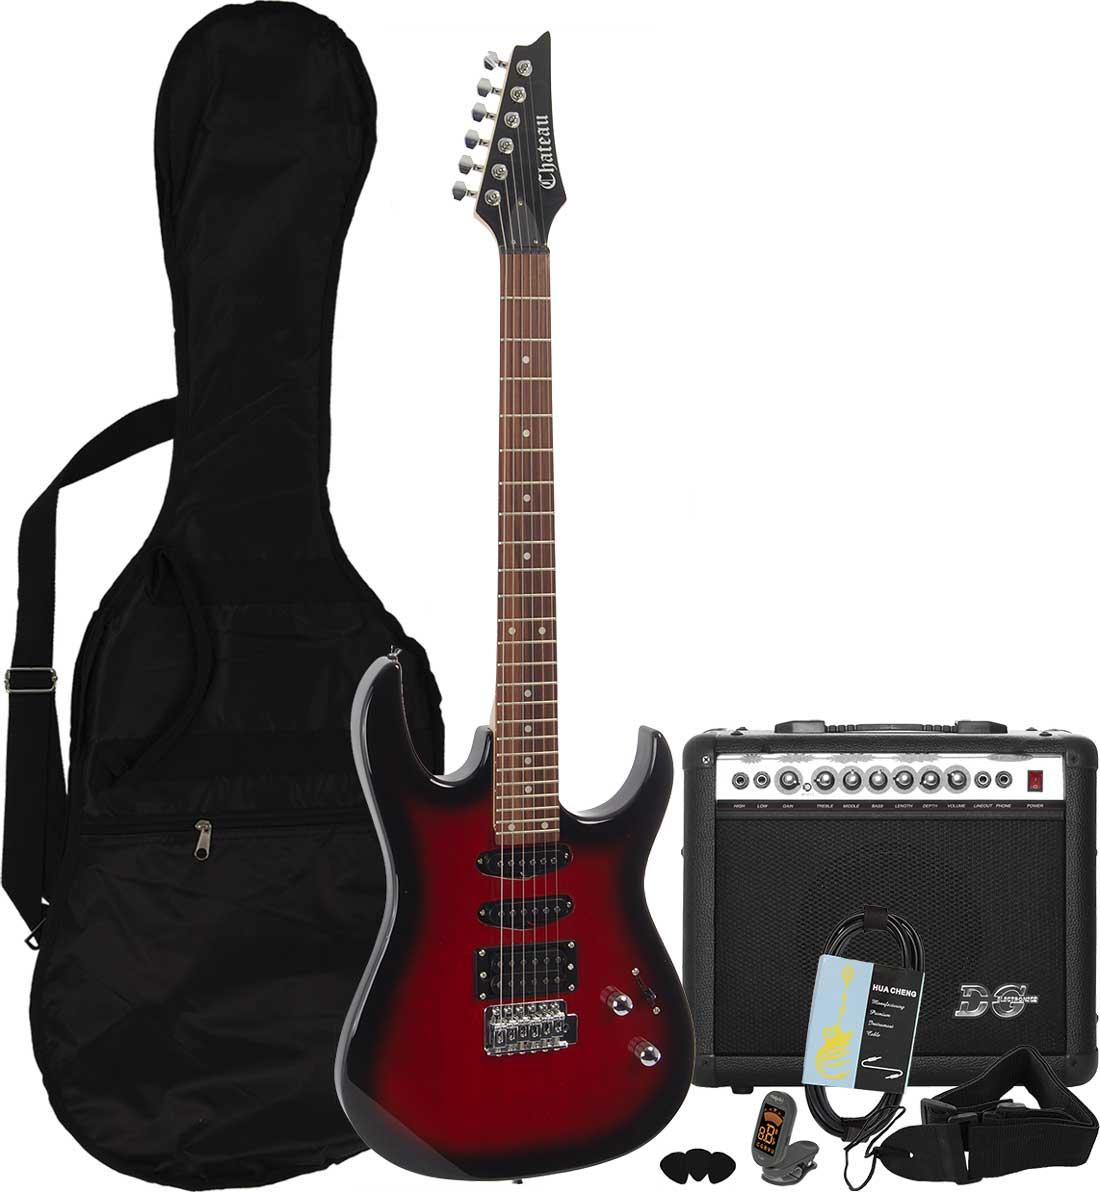 Billede af Chateau C08-IB2 el-guitar, rød, PAKKE 2